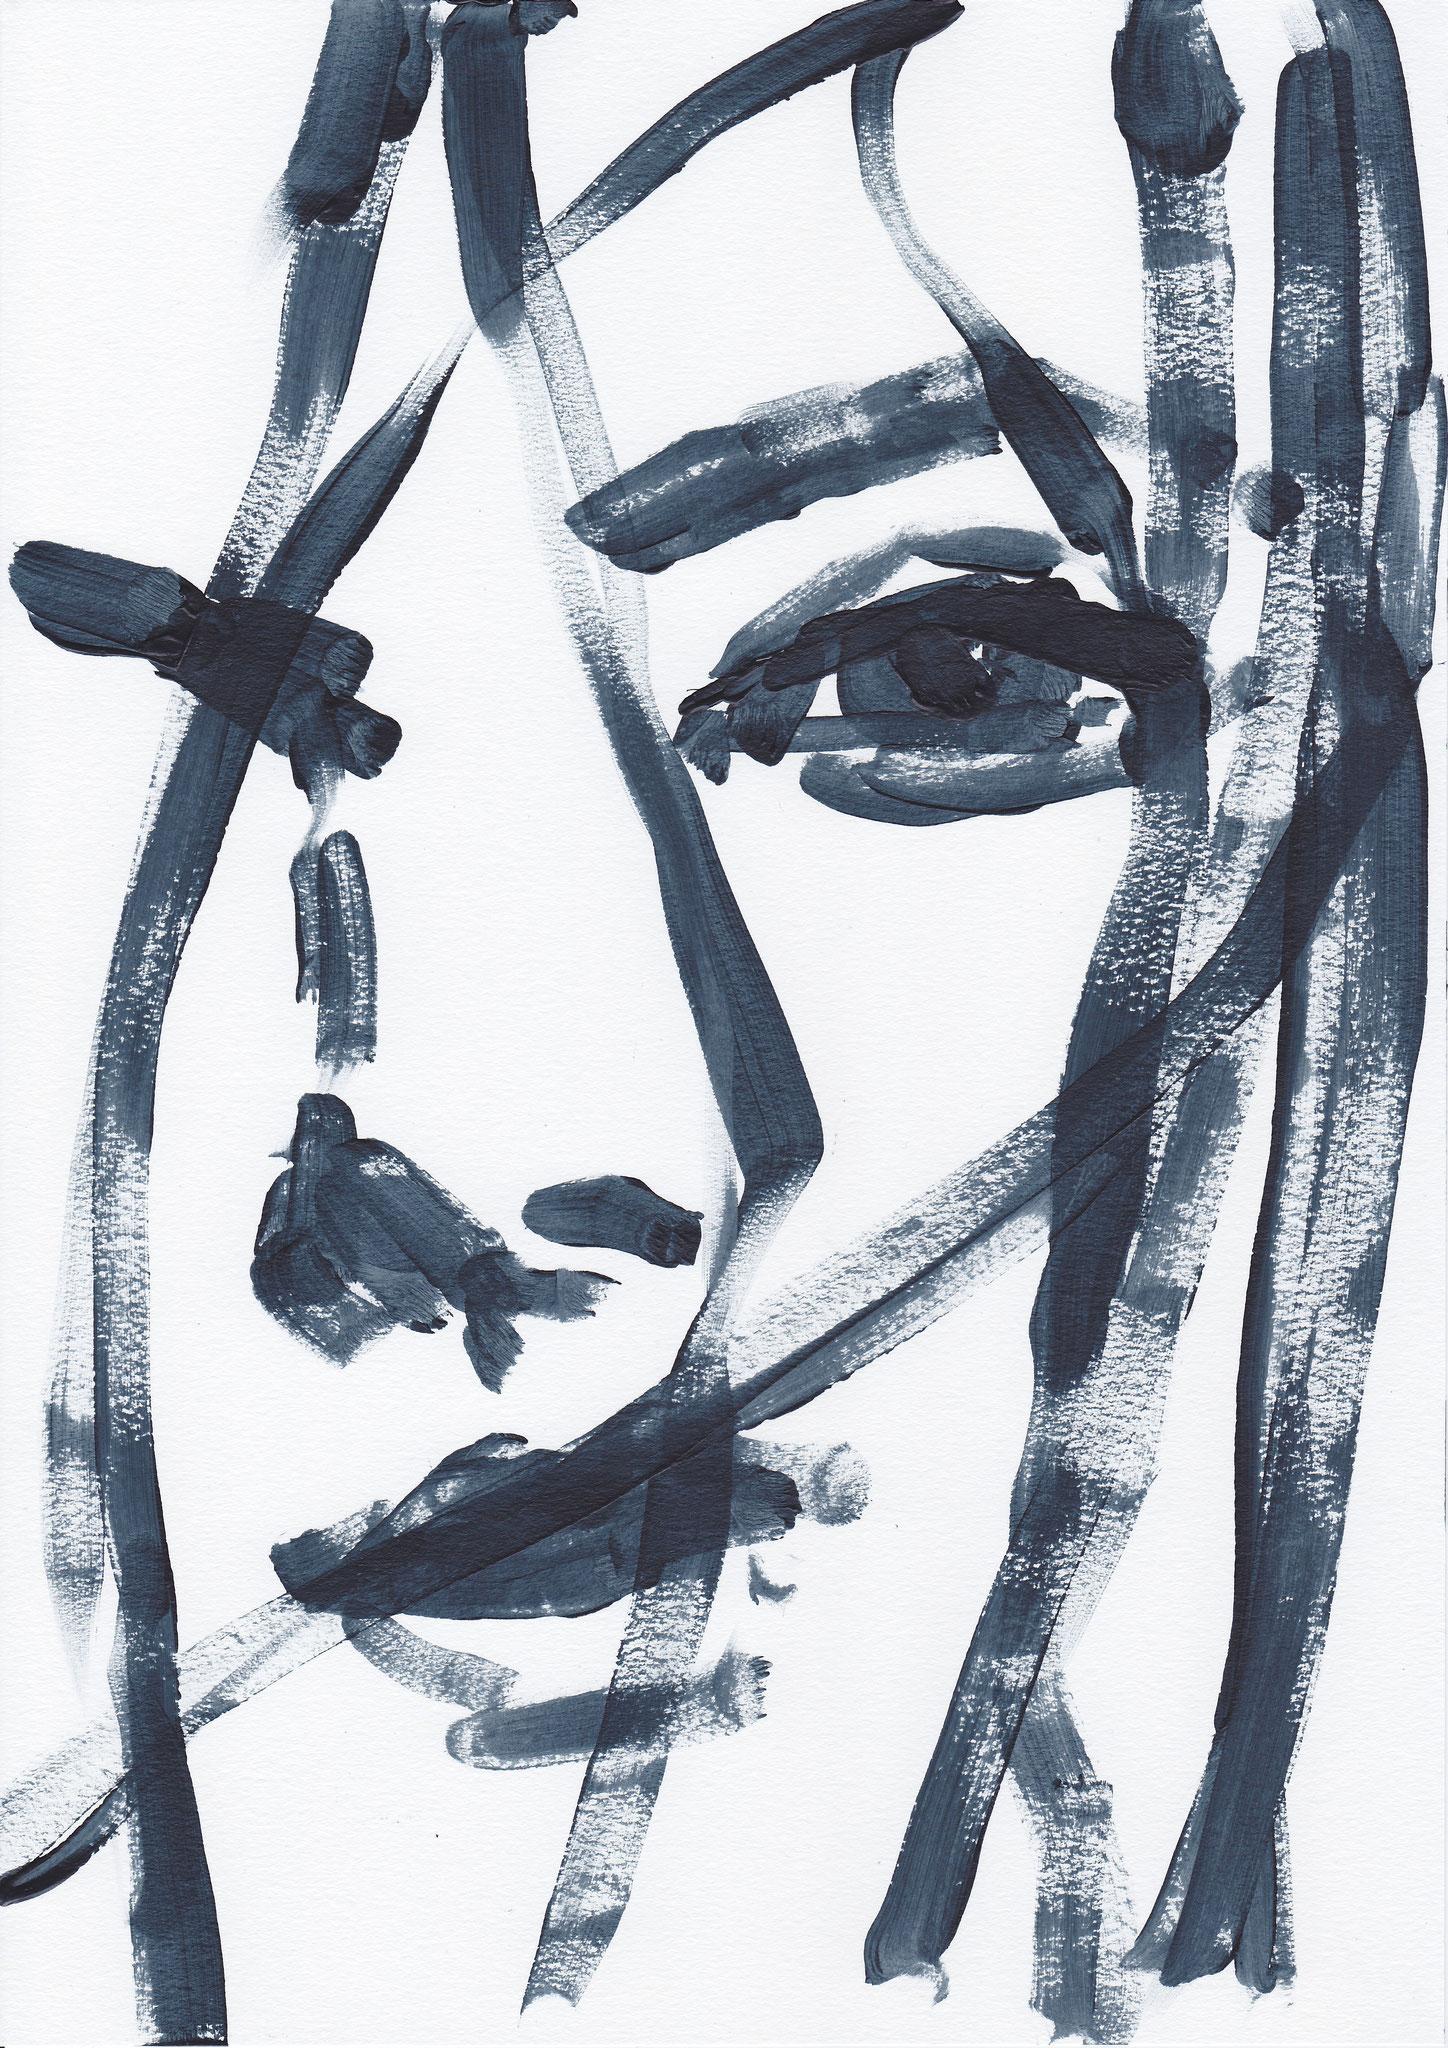 067 , acrylic on paper , 29.7 x 21cm , Selina Saranova